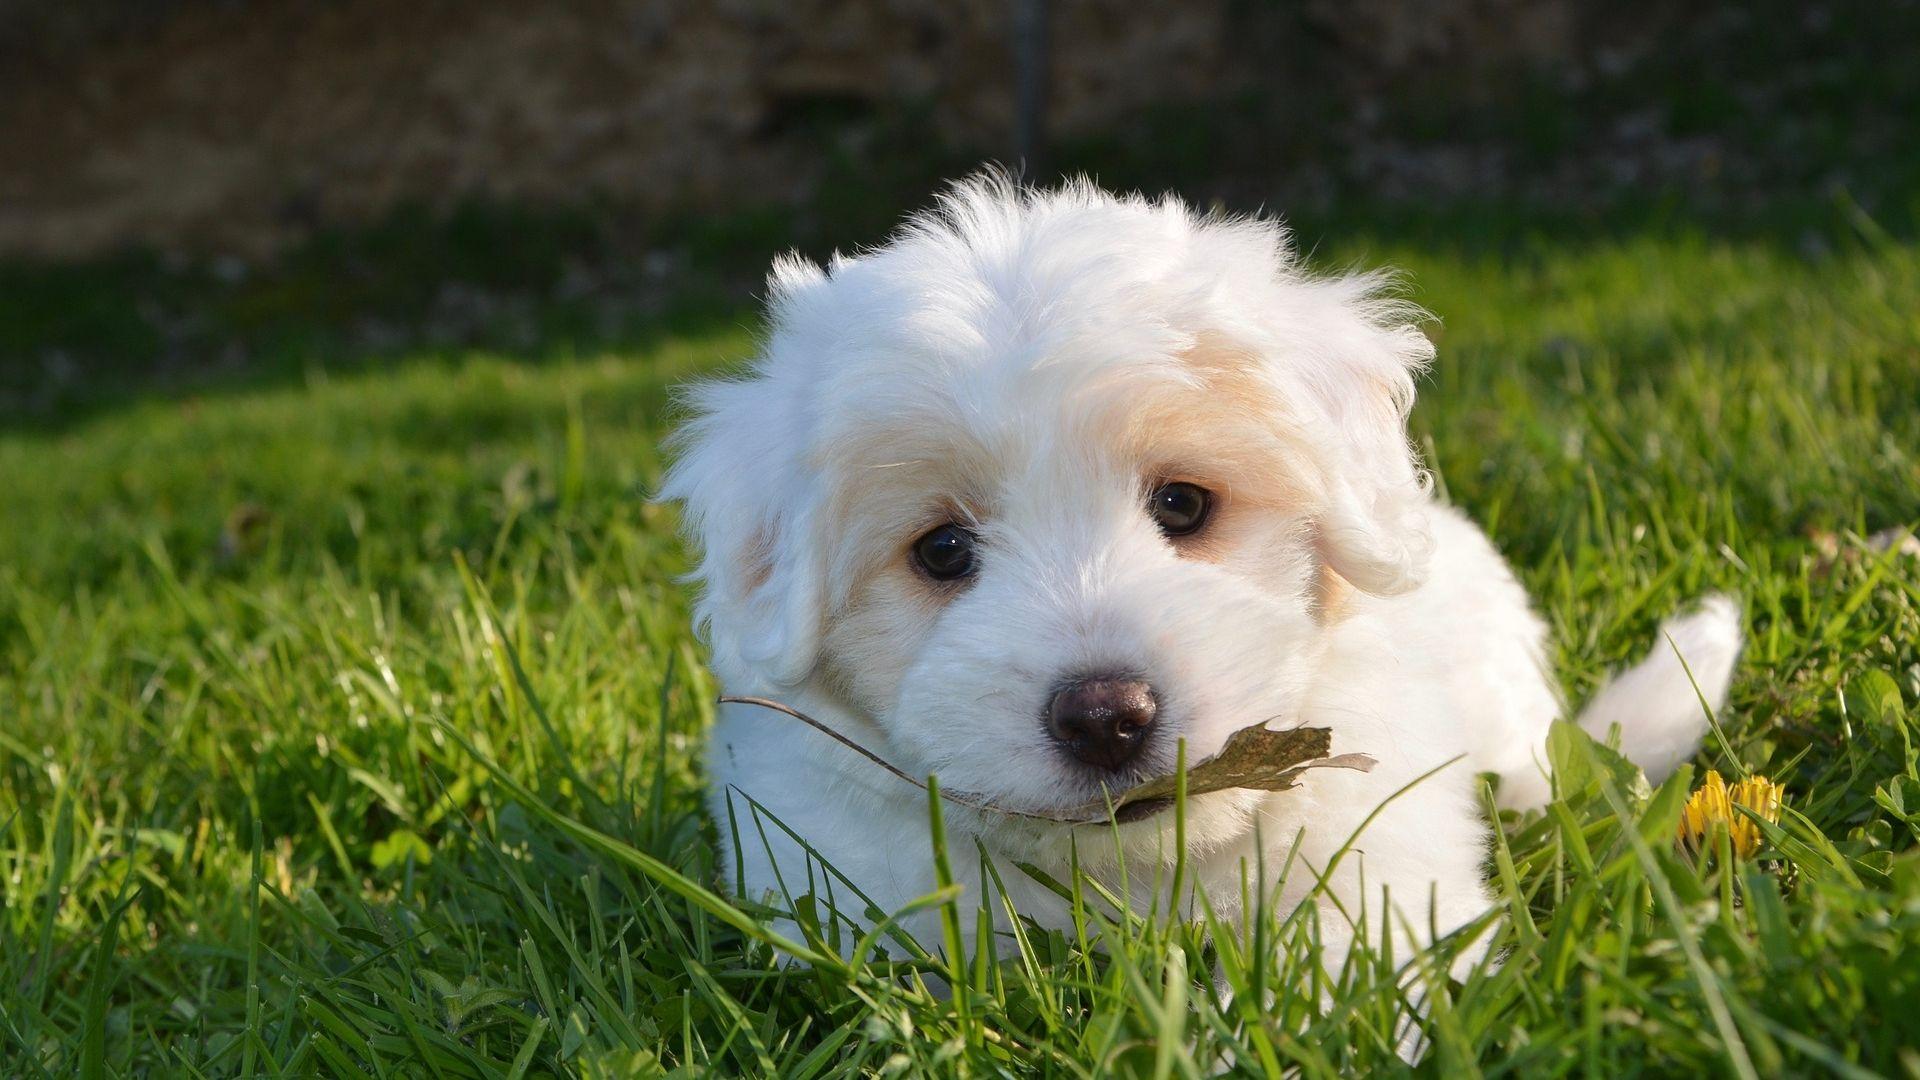 White Cute Puppy Hd Wallpaper Cute Dogs Cute Puppies Puppies